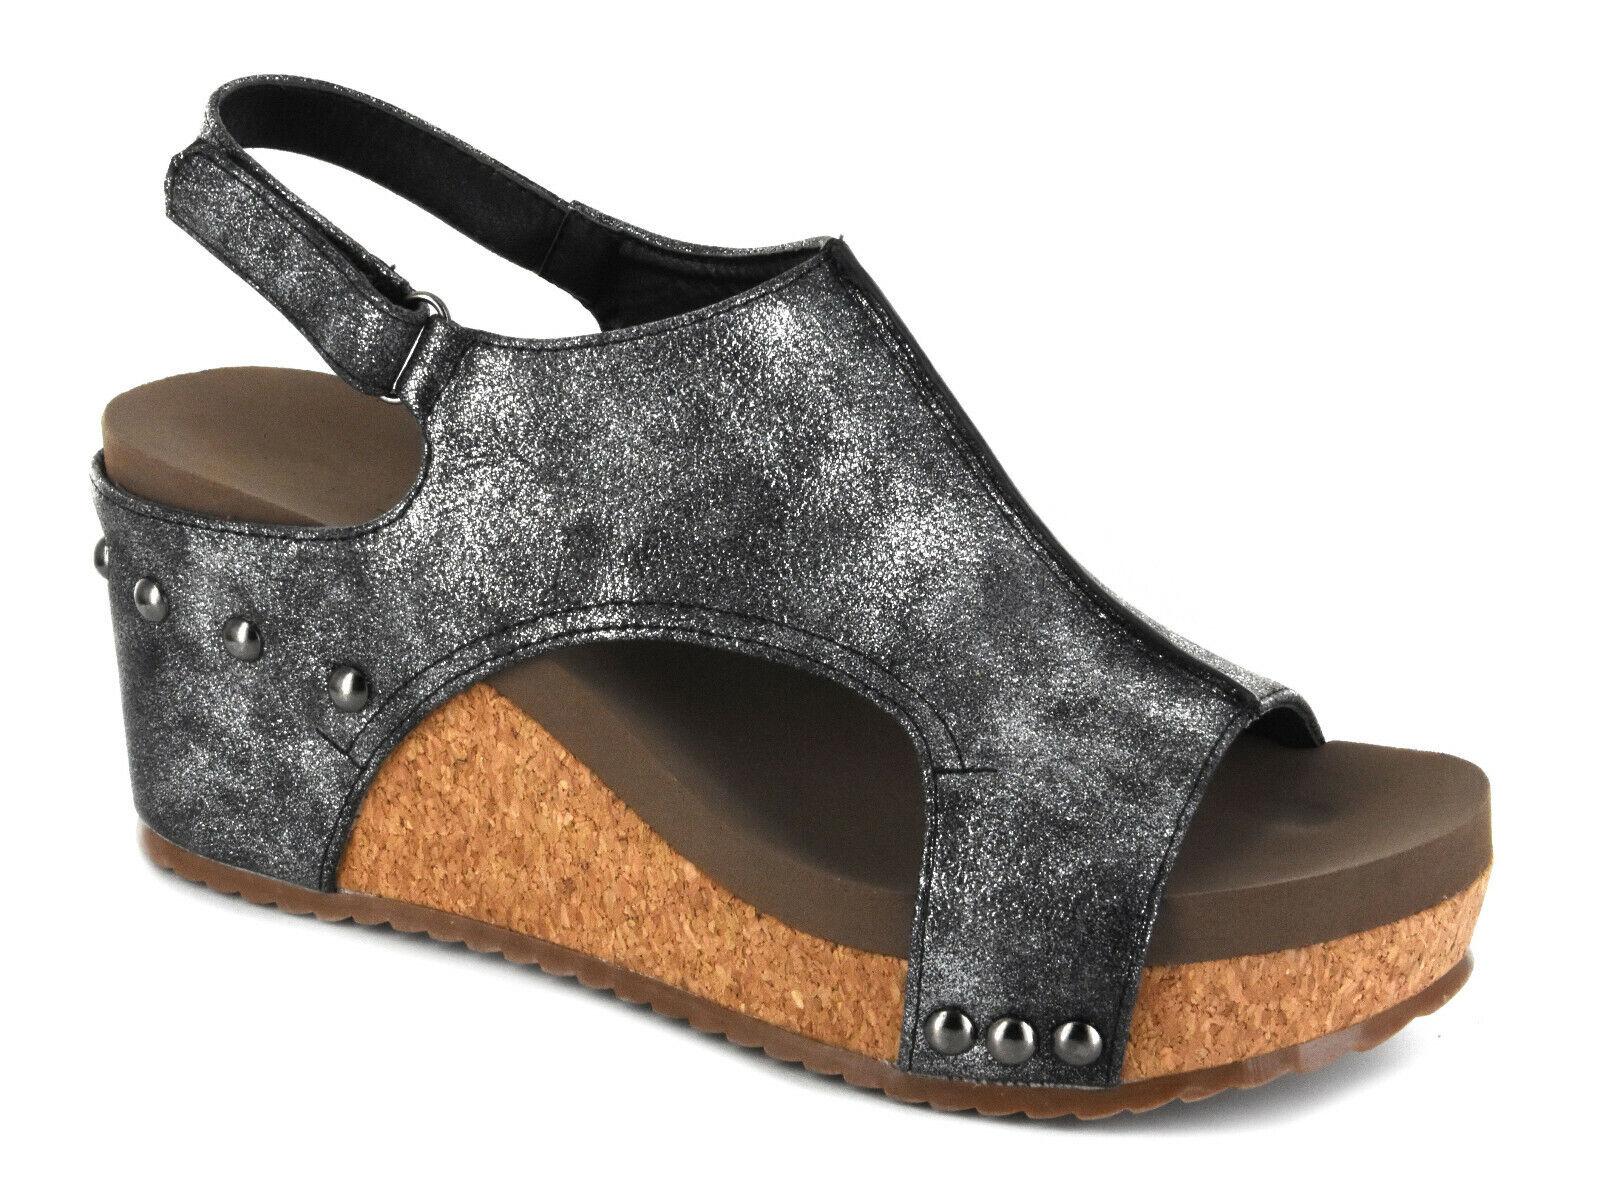 Corkys Women's Ingrid Wedge Sandals -  Black or Bronze